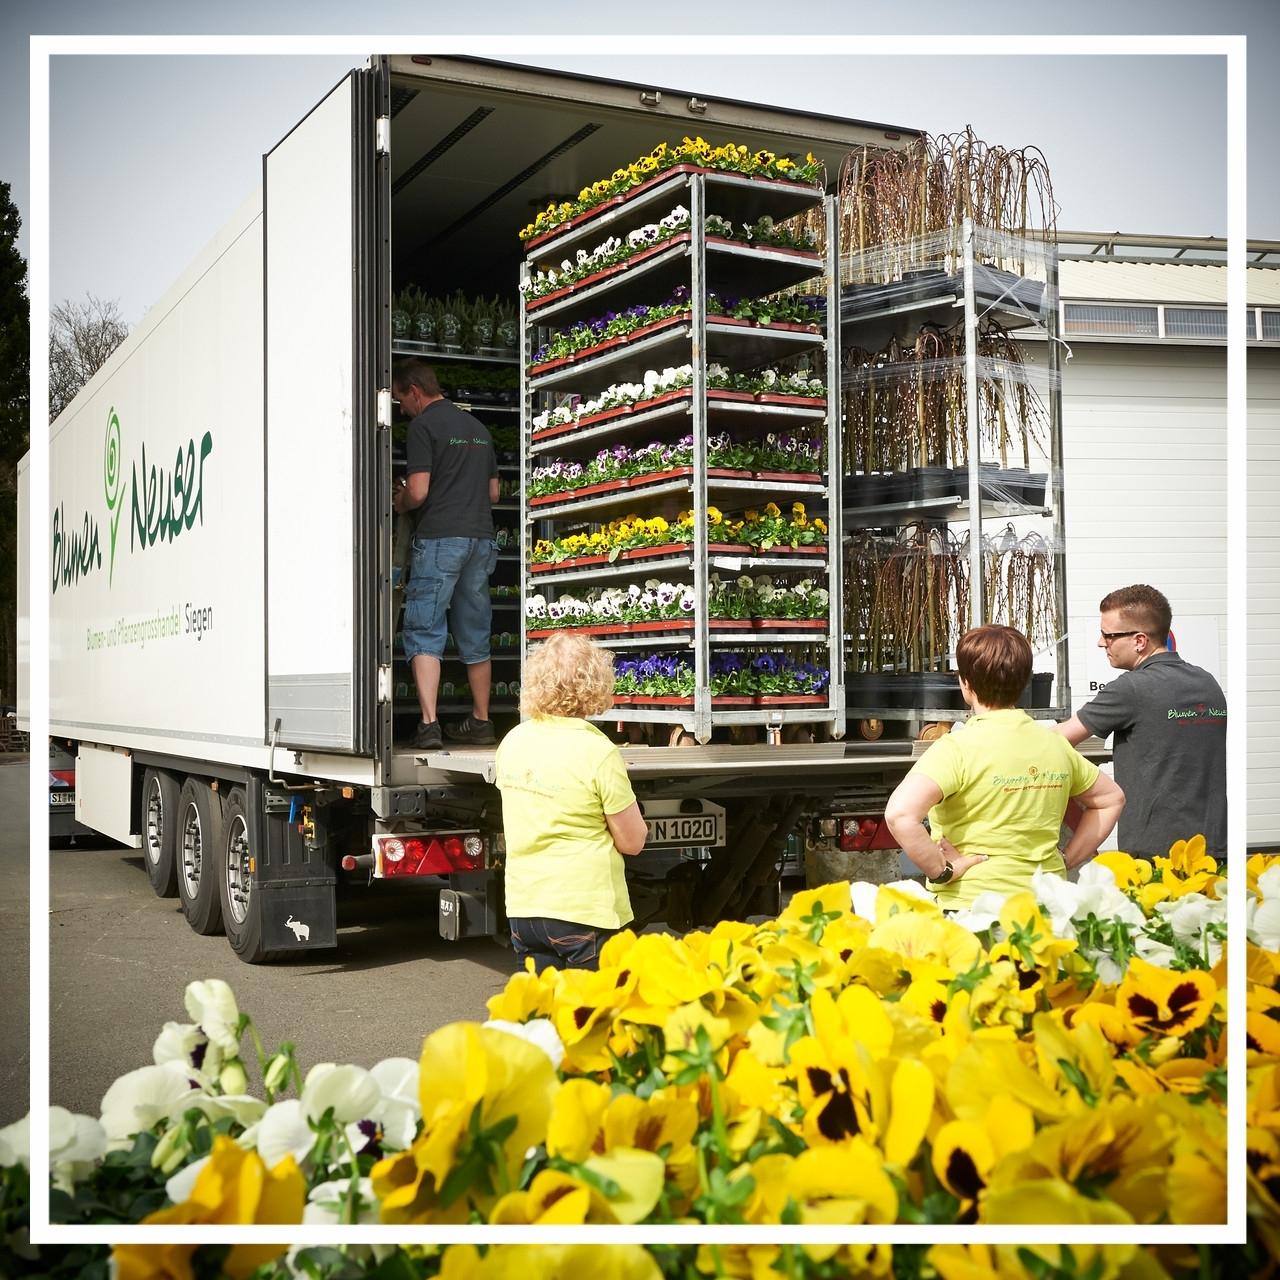 Warenanlieferung im Frühling